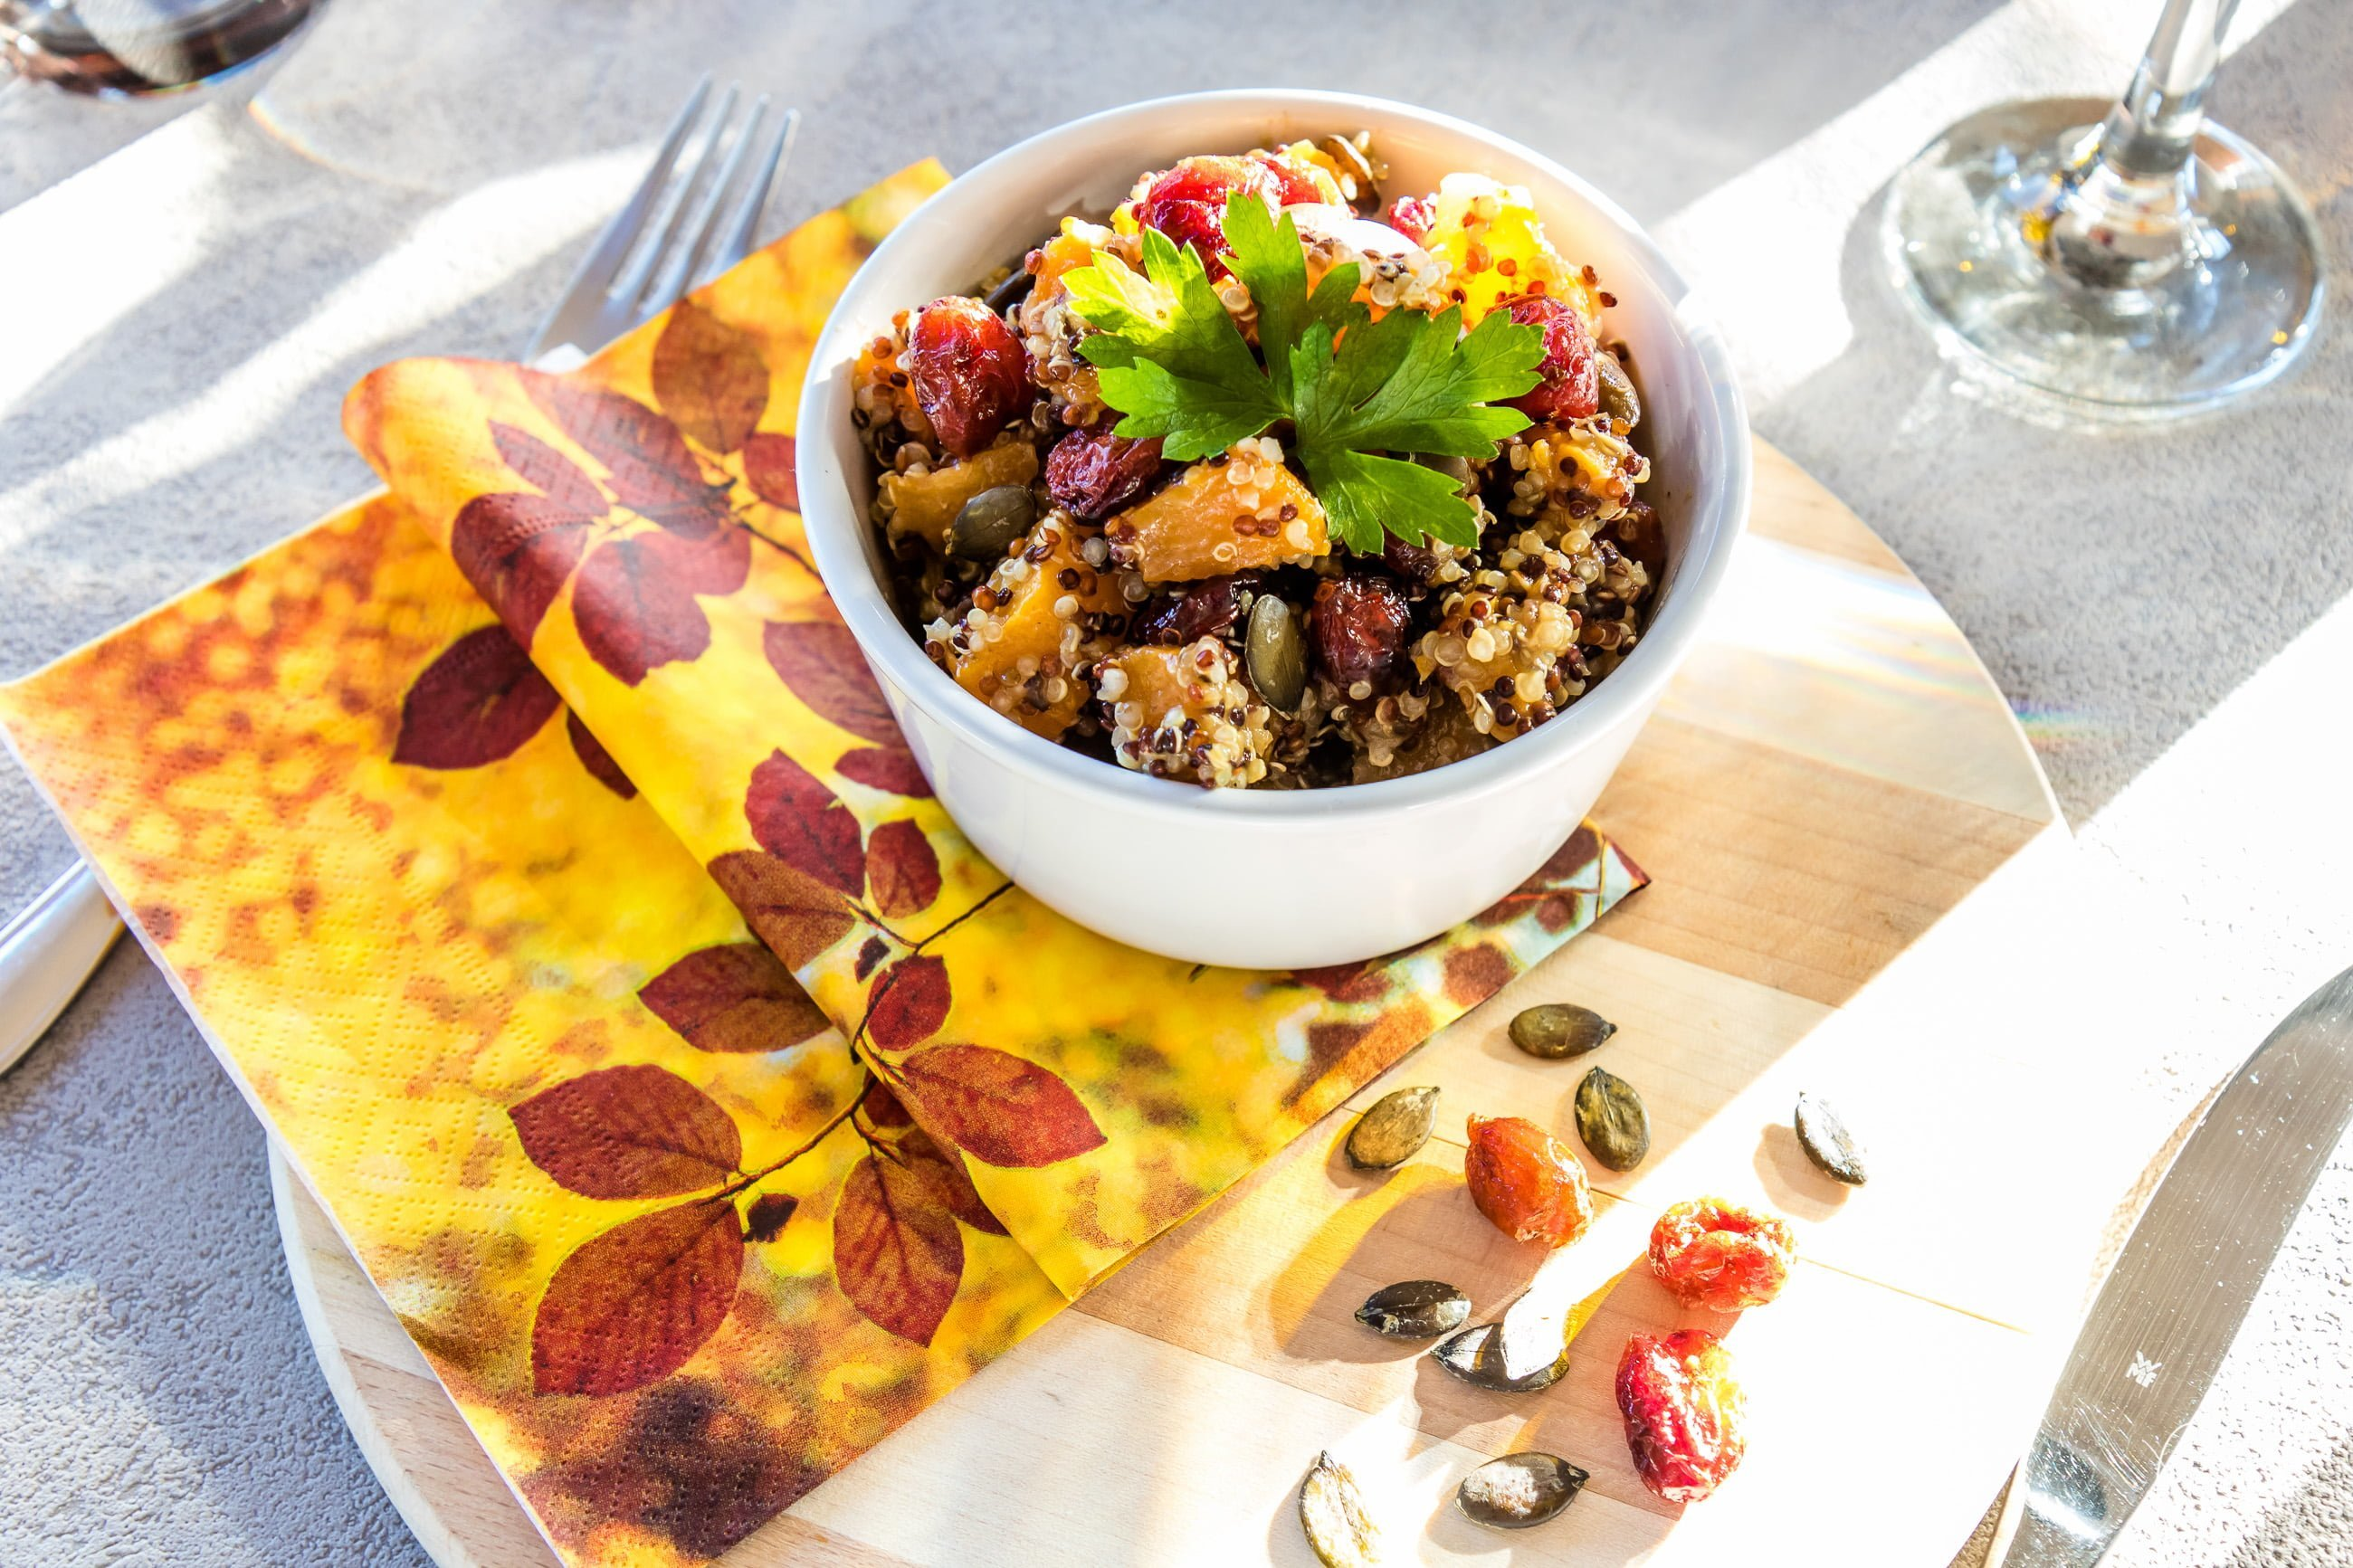 herbst salat quinoa k rbis cranberry lifestyle travel food blog aus der schweiz. Black Bedroom Furniture Sets. Home Design Ideas